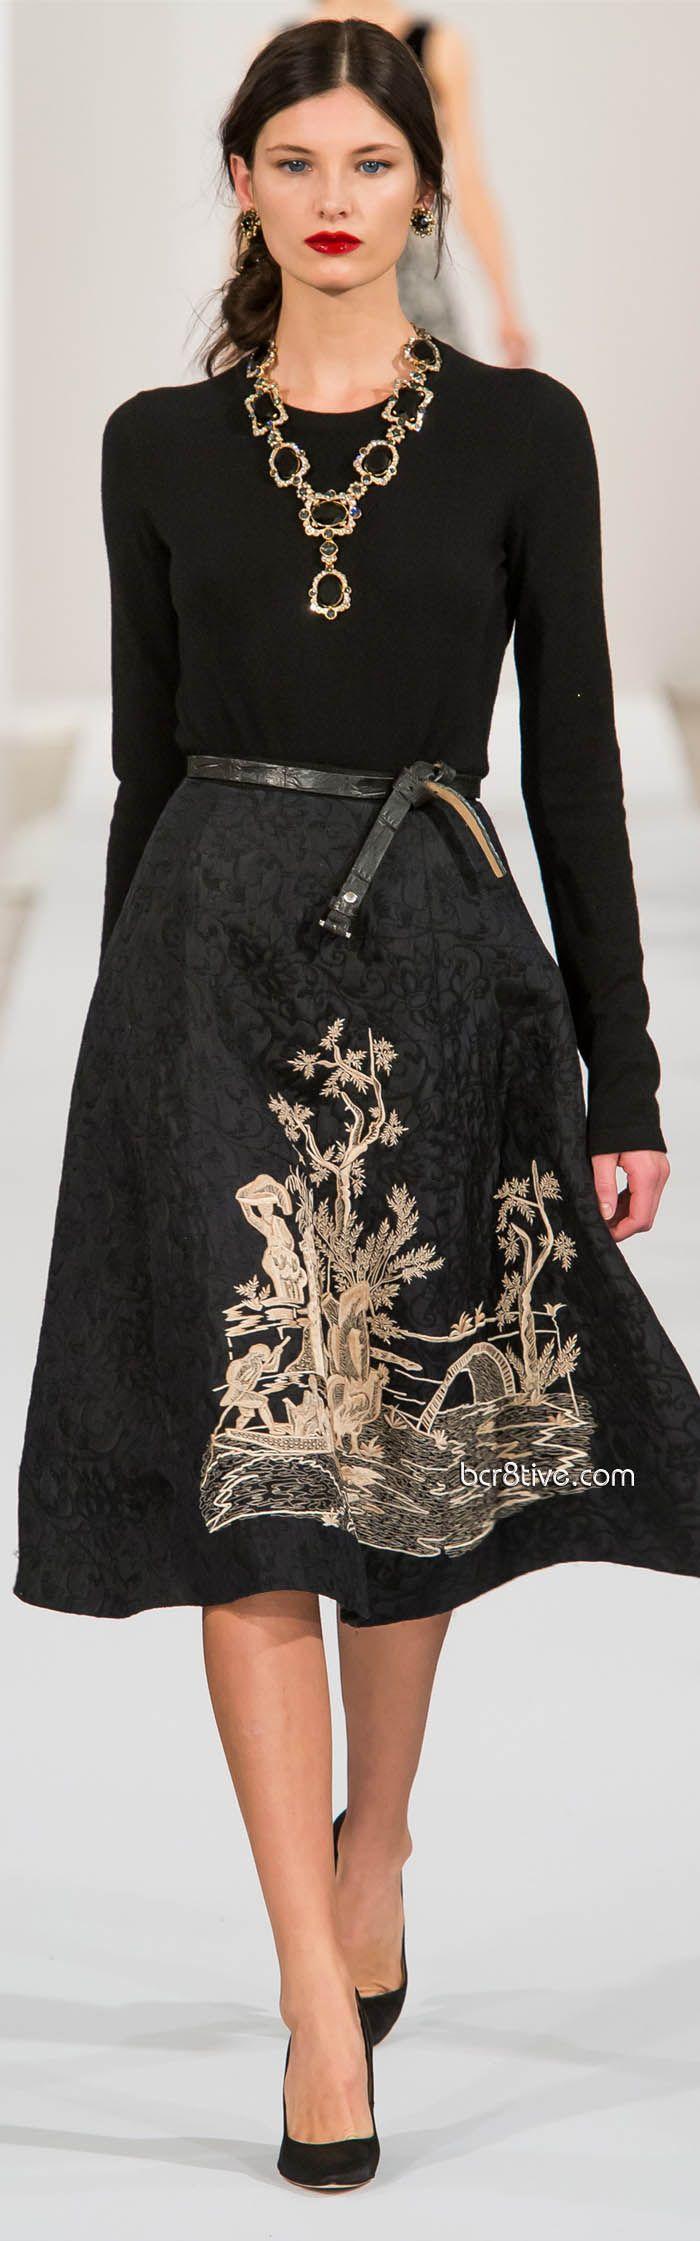 Oscar de la Renta Fall Winter 2013 New York Fashion Week